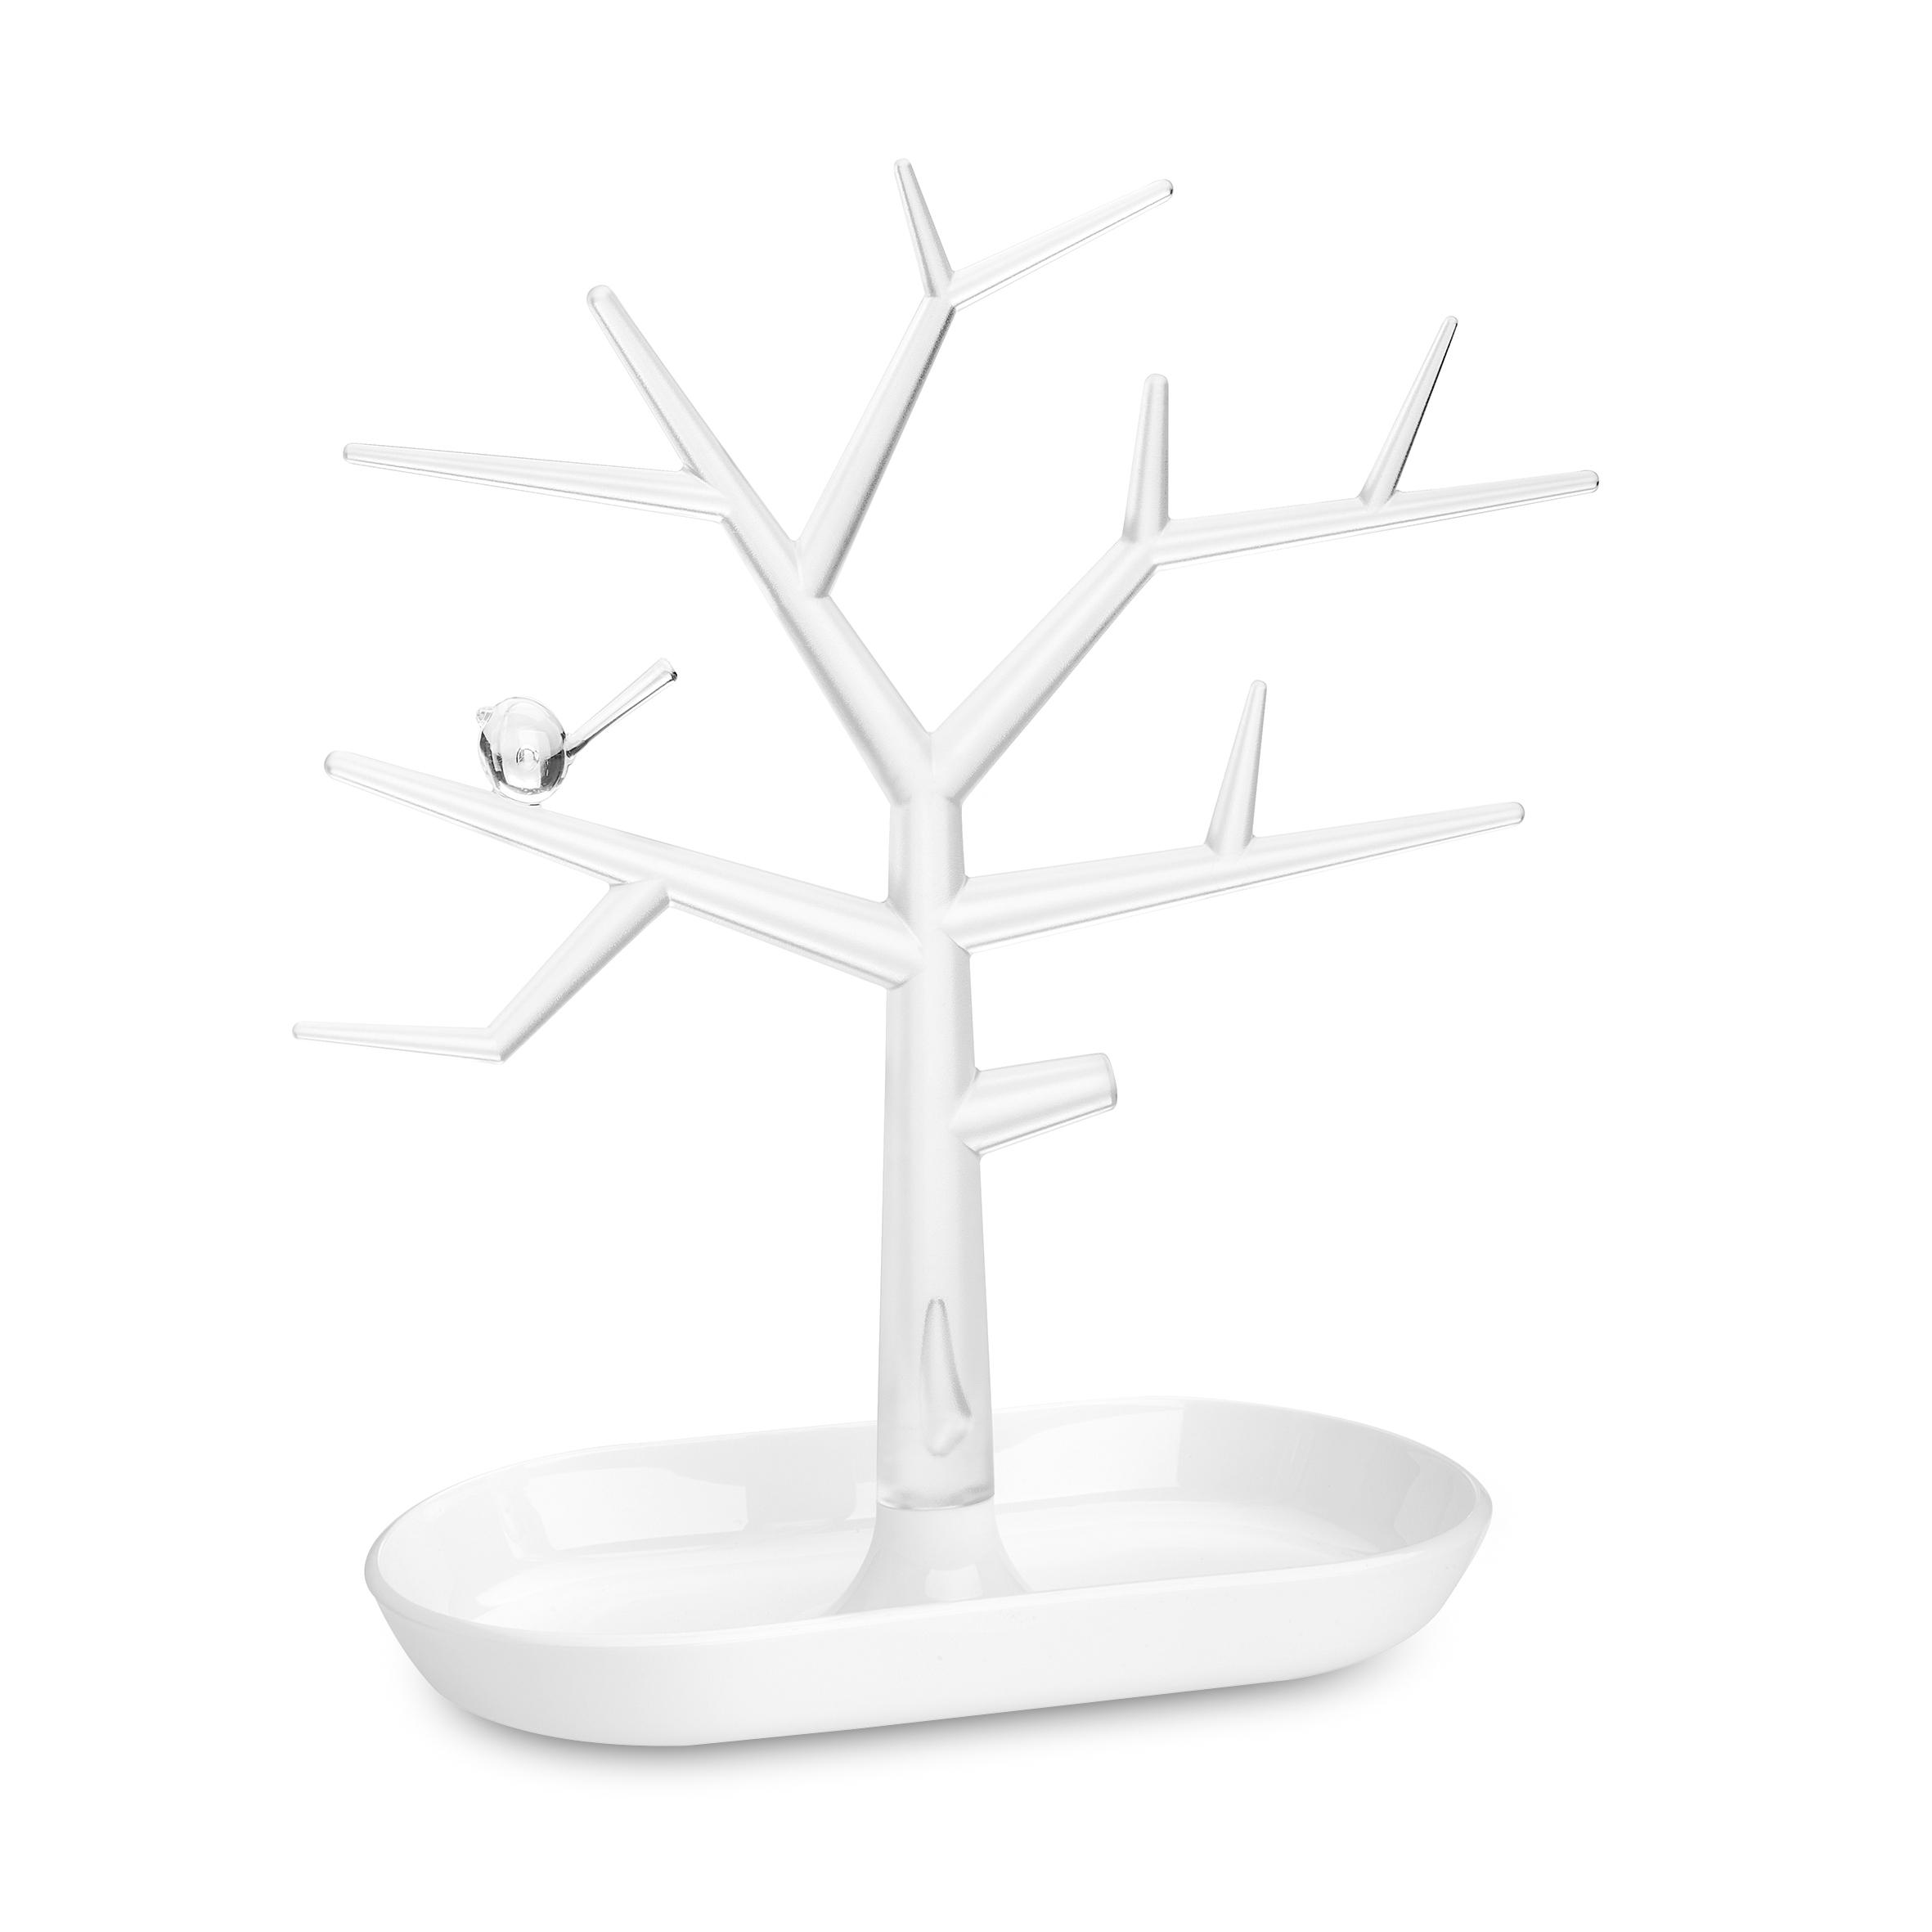 Suport pentru bijuterii din termoplastic Trinket Tree Alb, l27,3xA12,8xH30,6 cm imagine